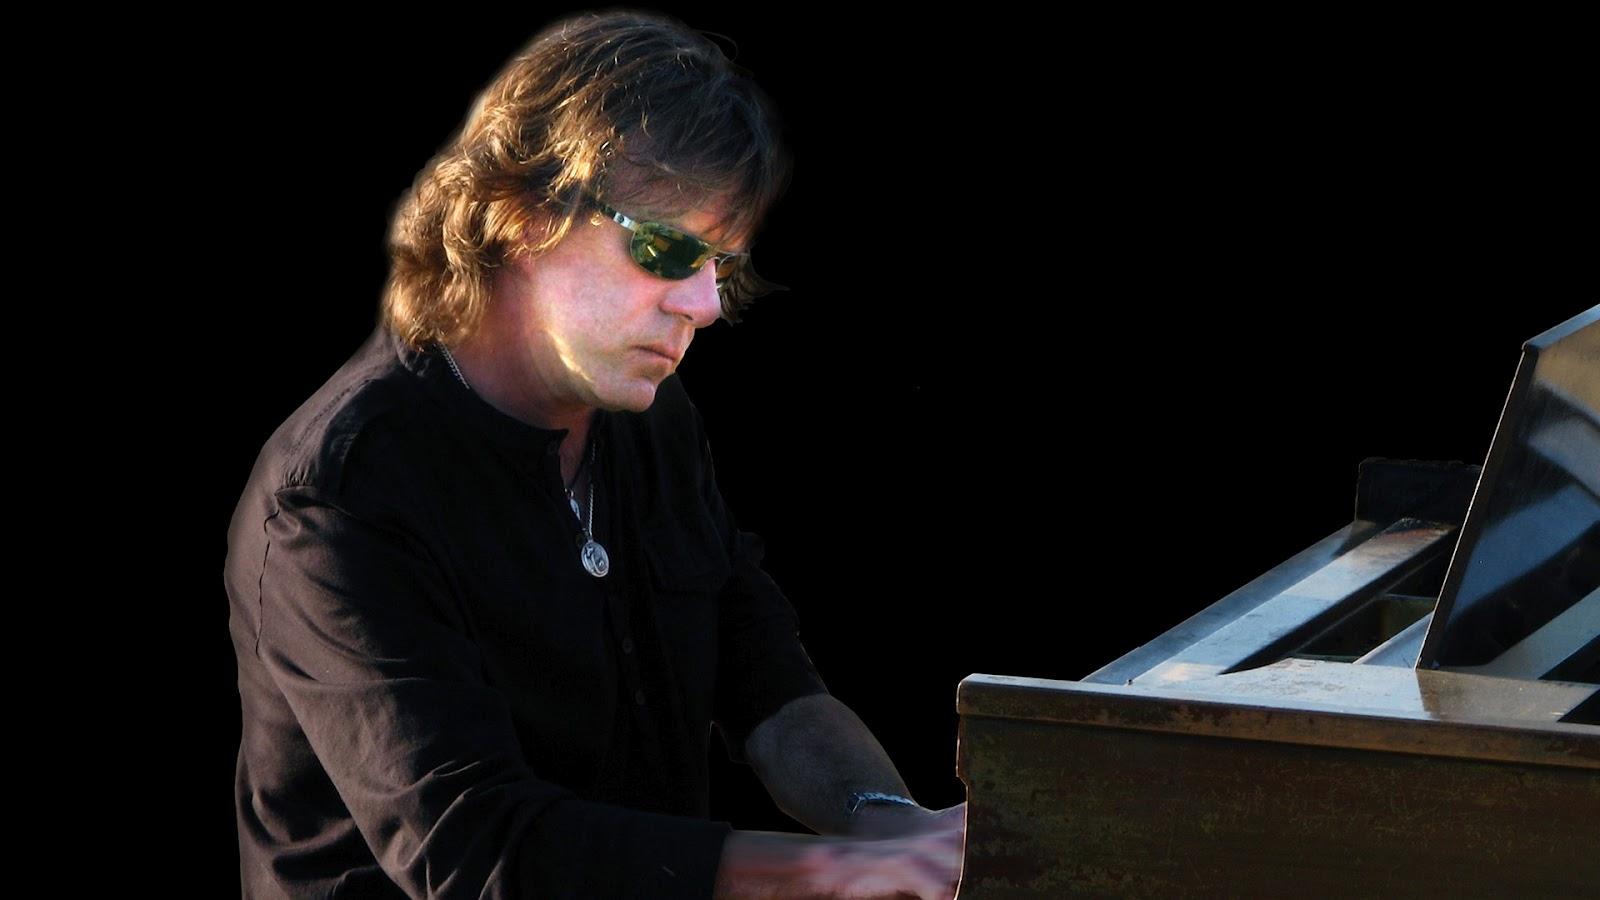 R.I.P Keith Emerson Keith_Emerson